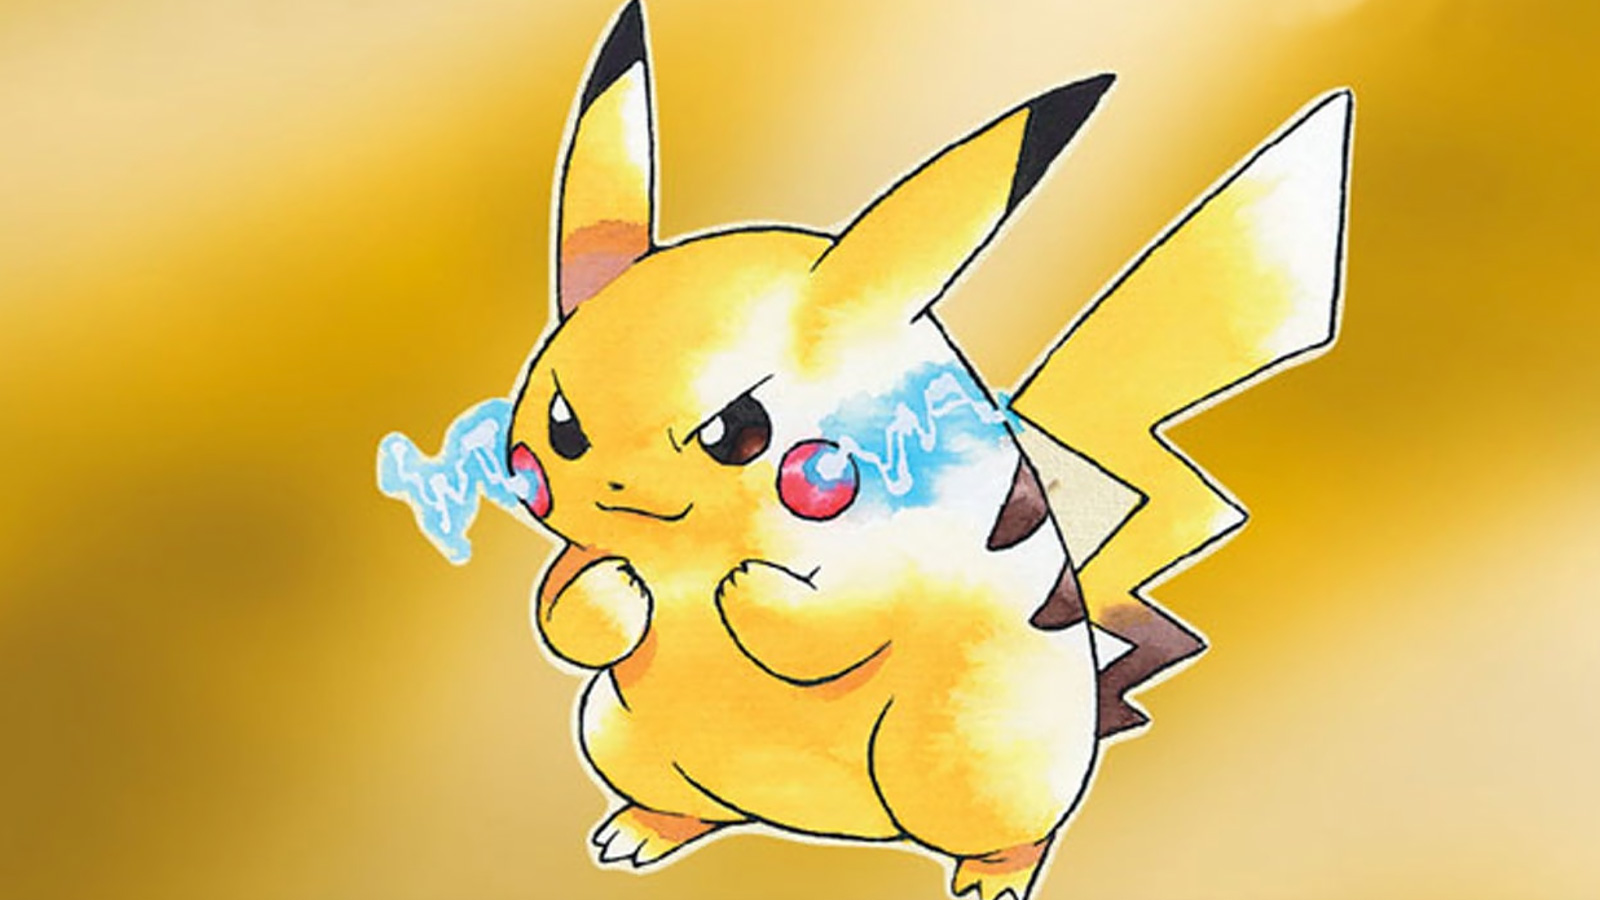 Pikachu promotion for Pokemon Yellow 1998.